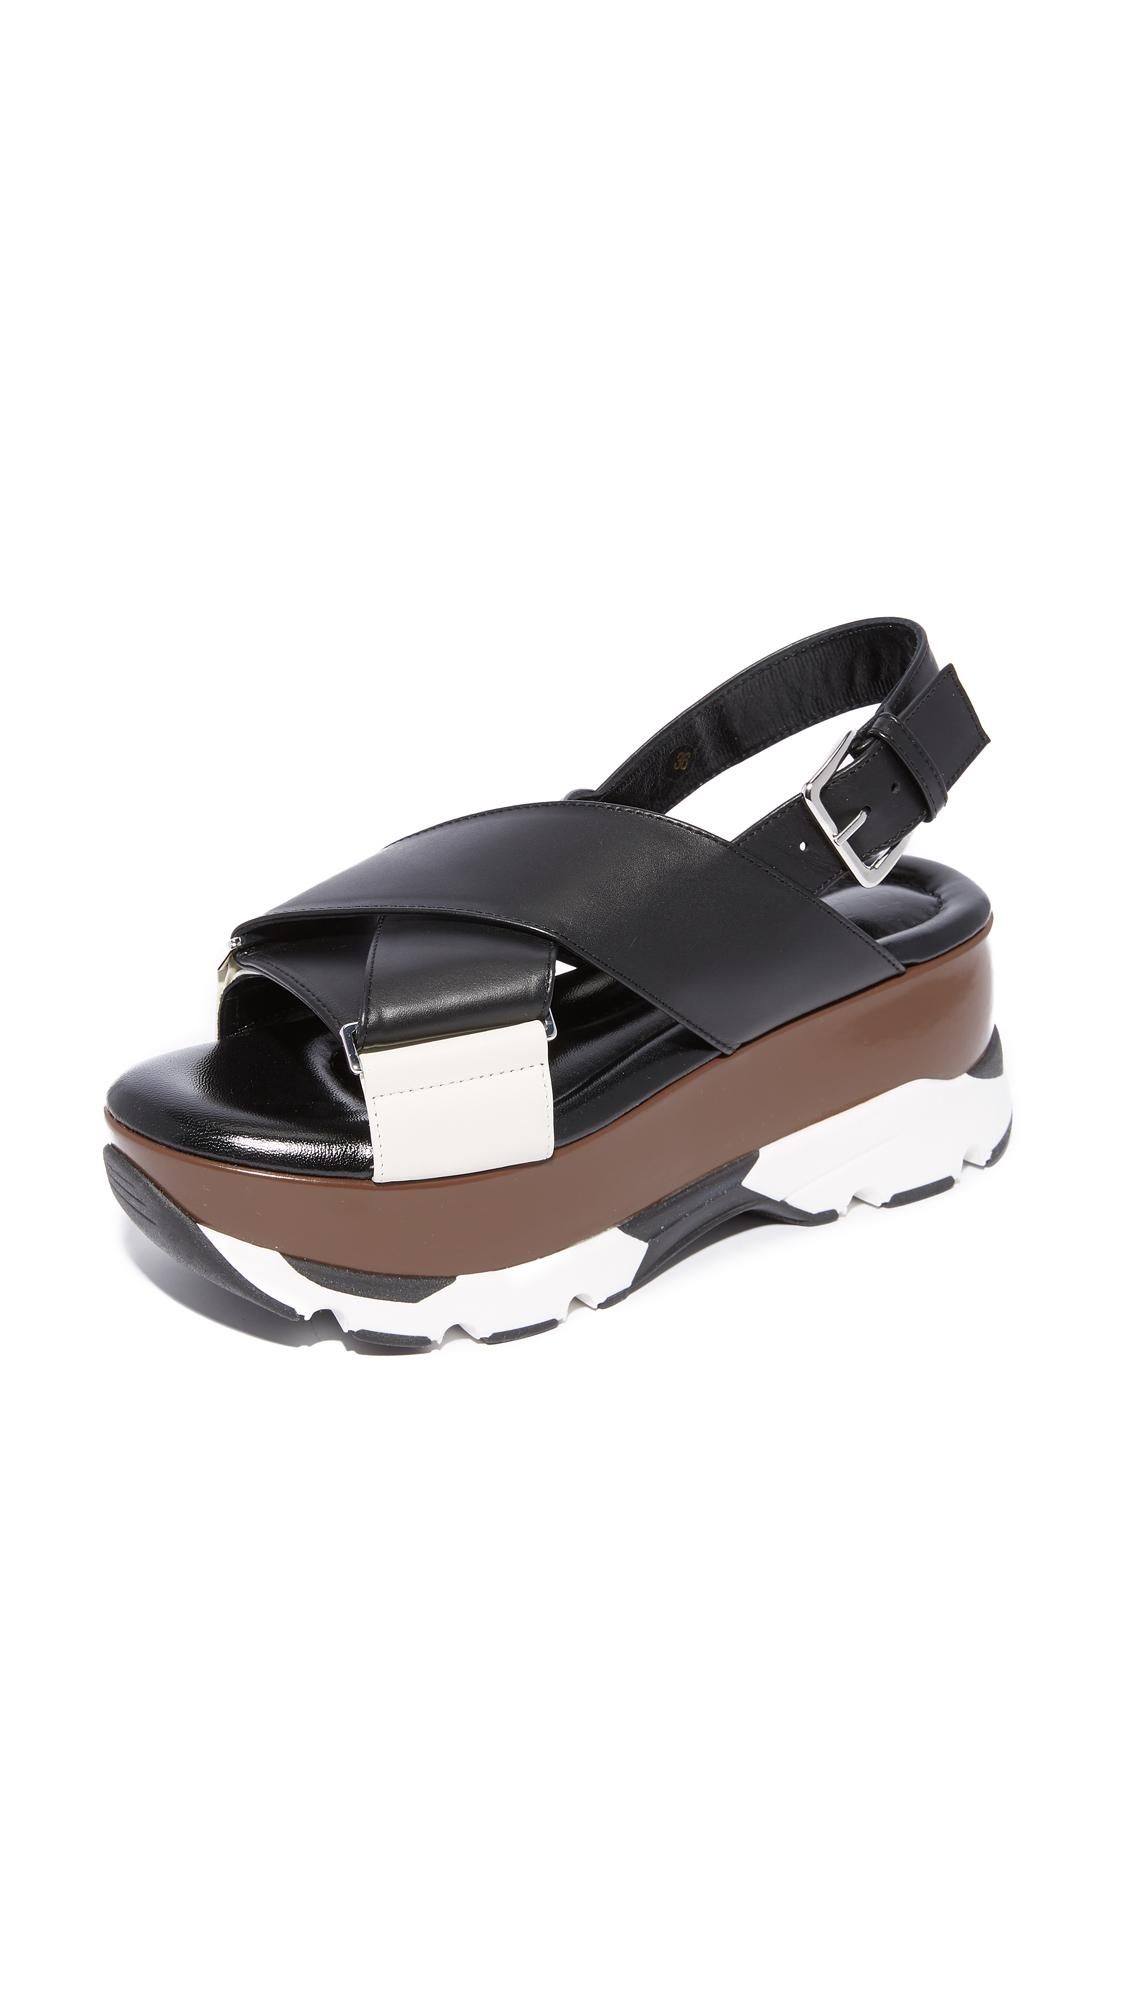 Marni Platform Sandals - Black/Limestone